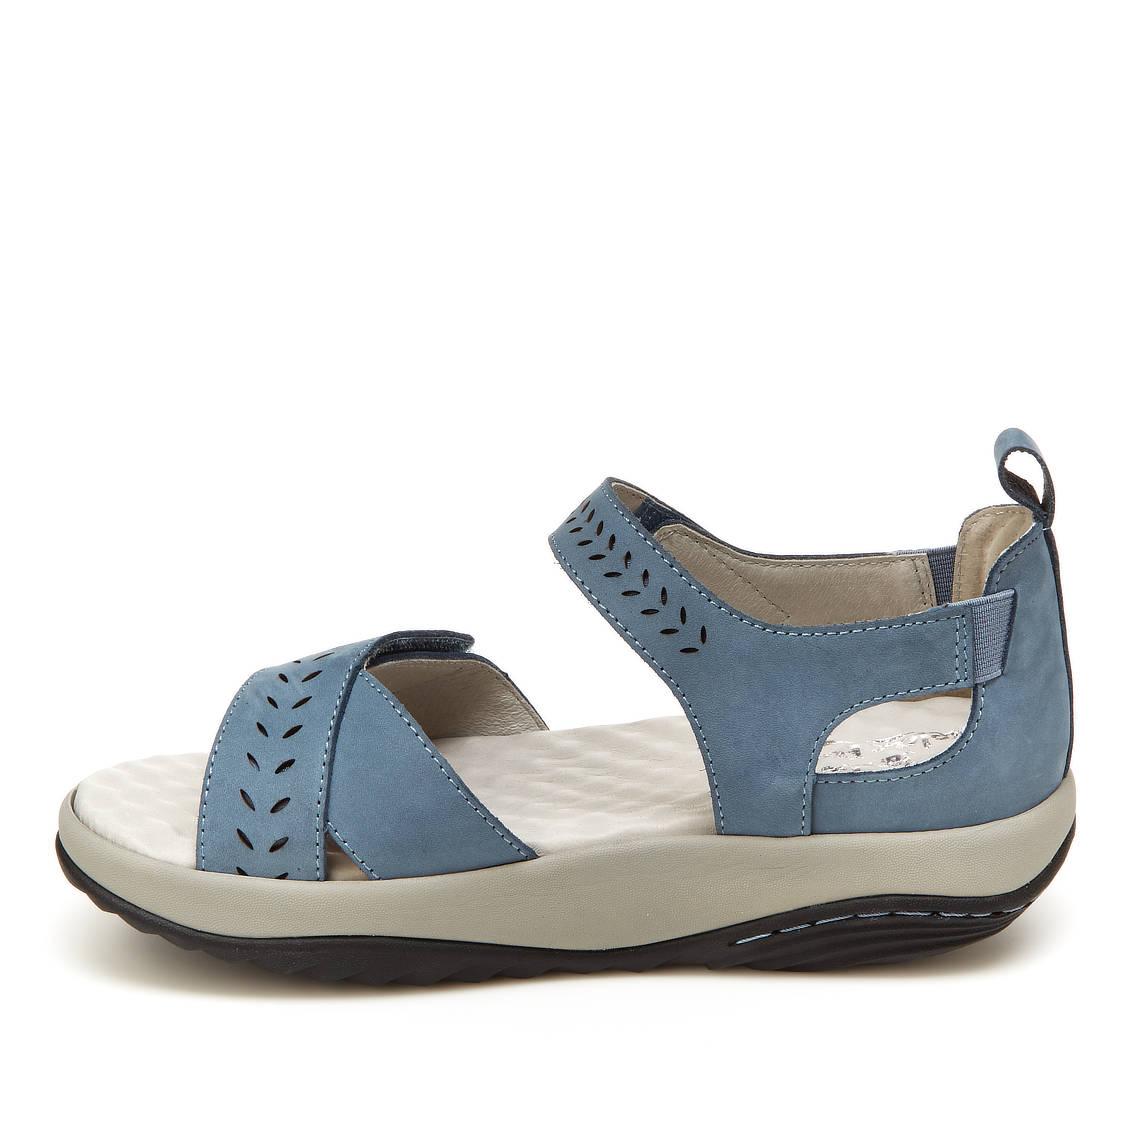 jambu-sedona-j1sed06-lt-blue-4